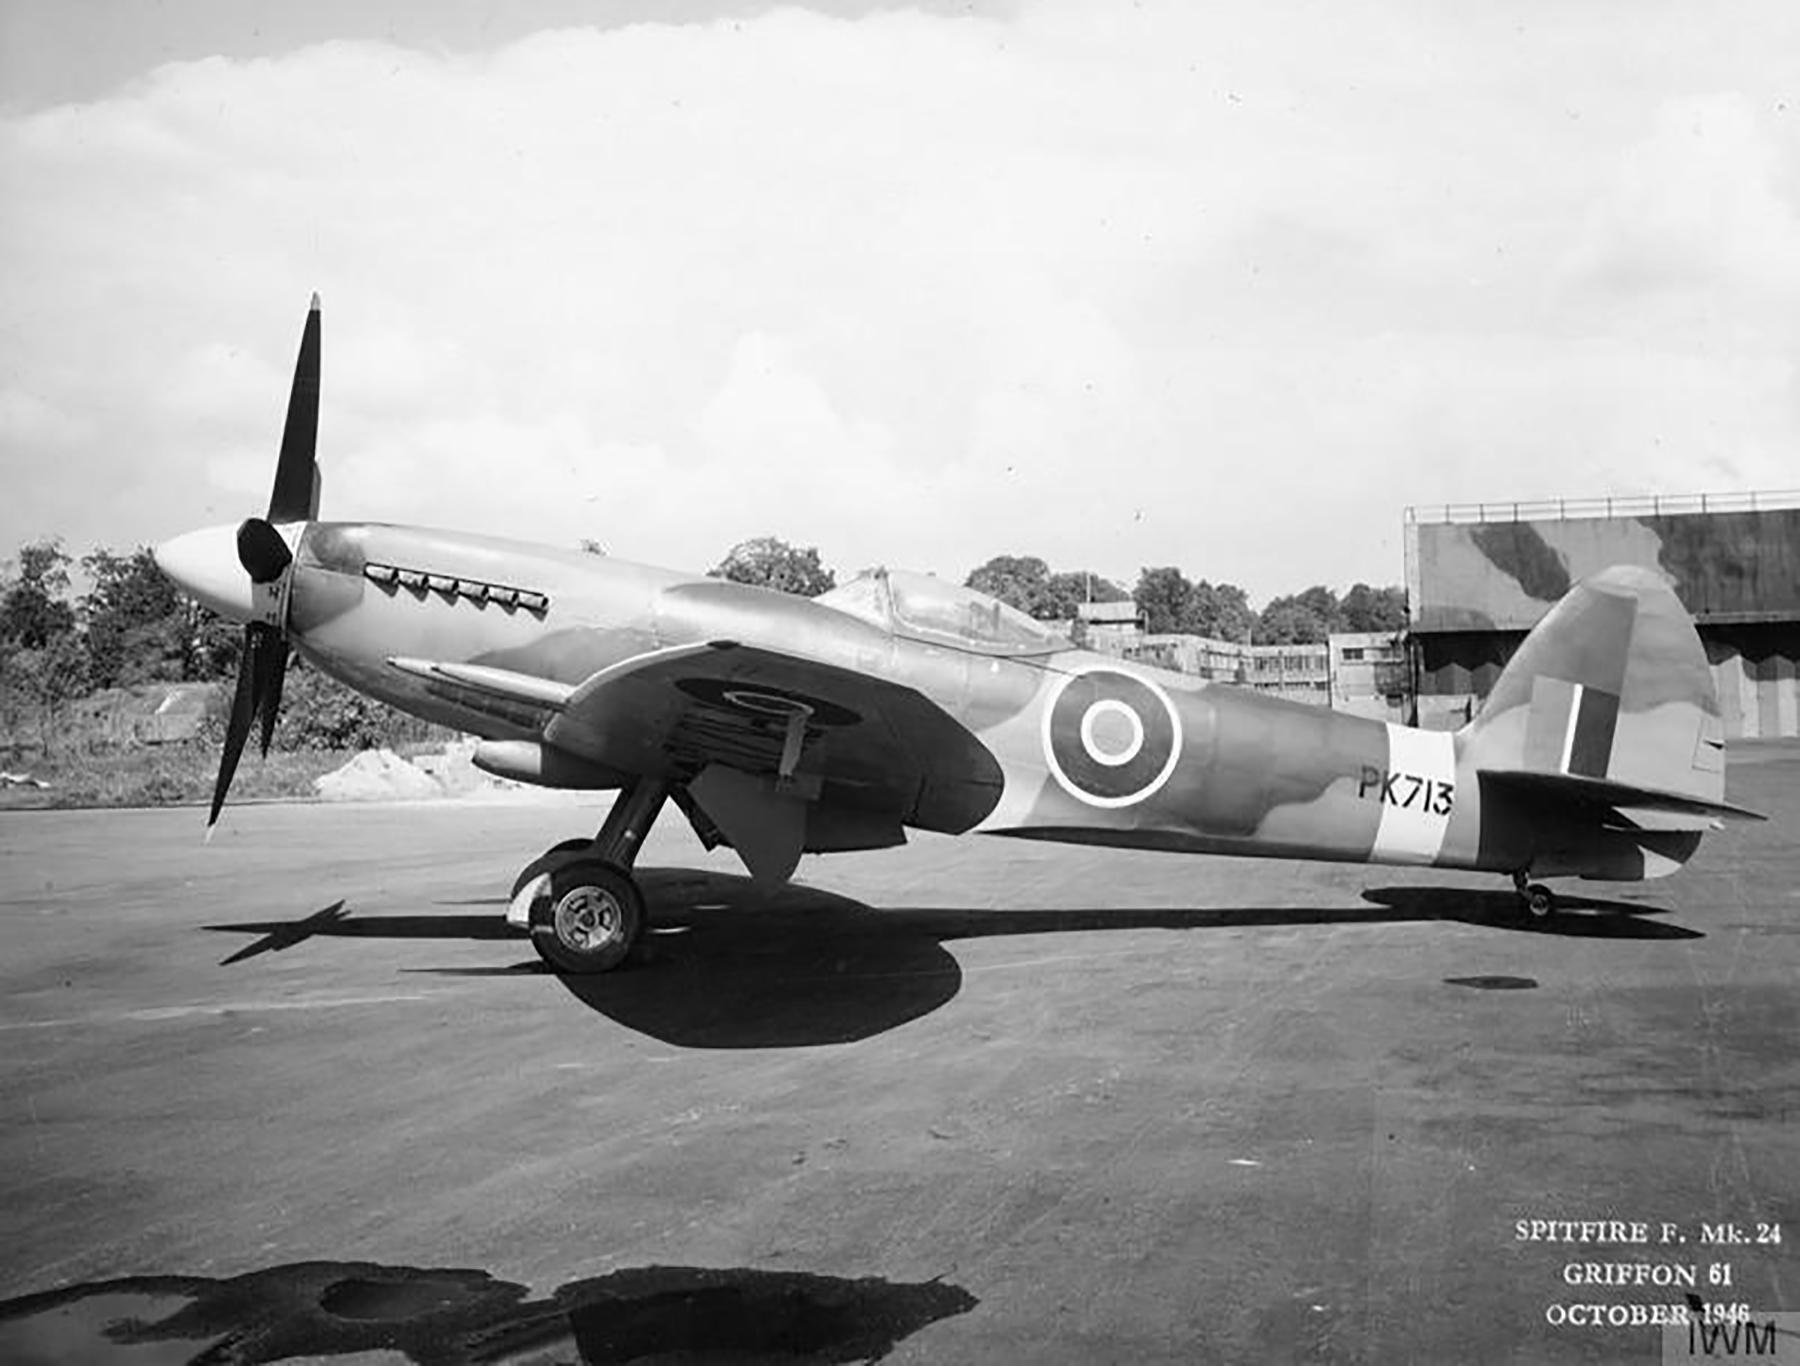 Spitfire F24 PK713 Oct 1946 01